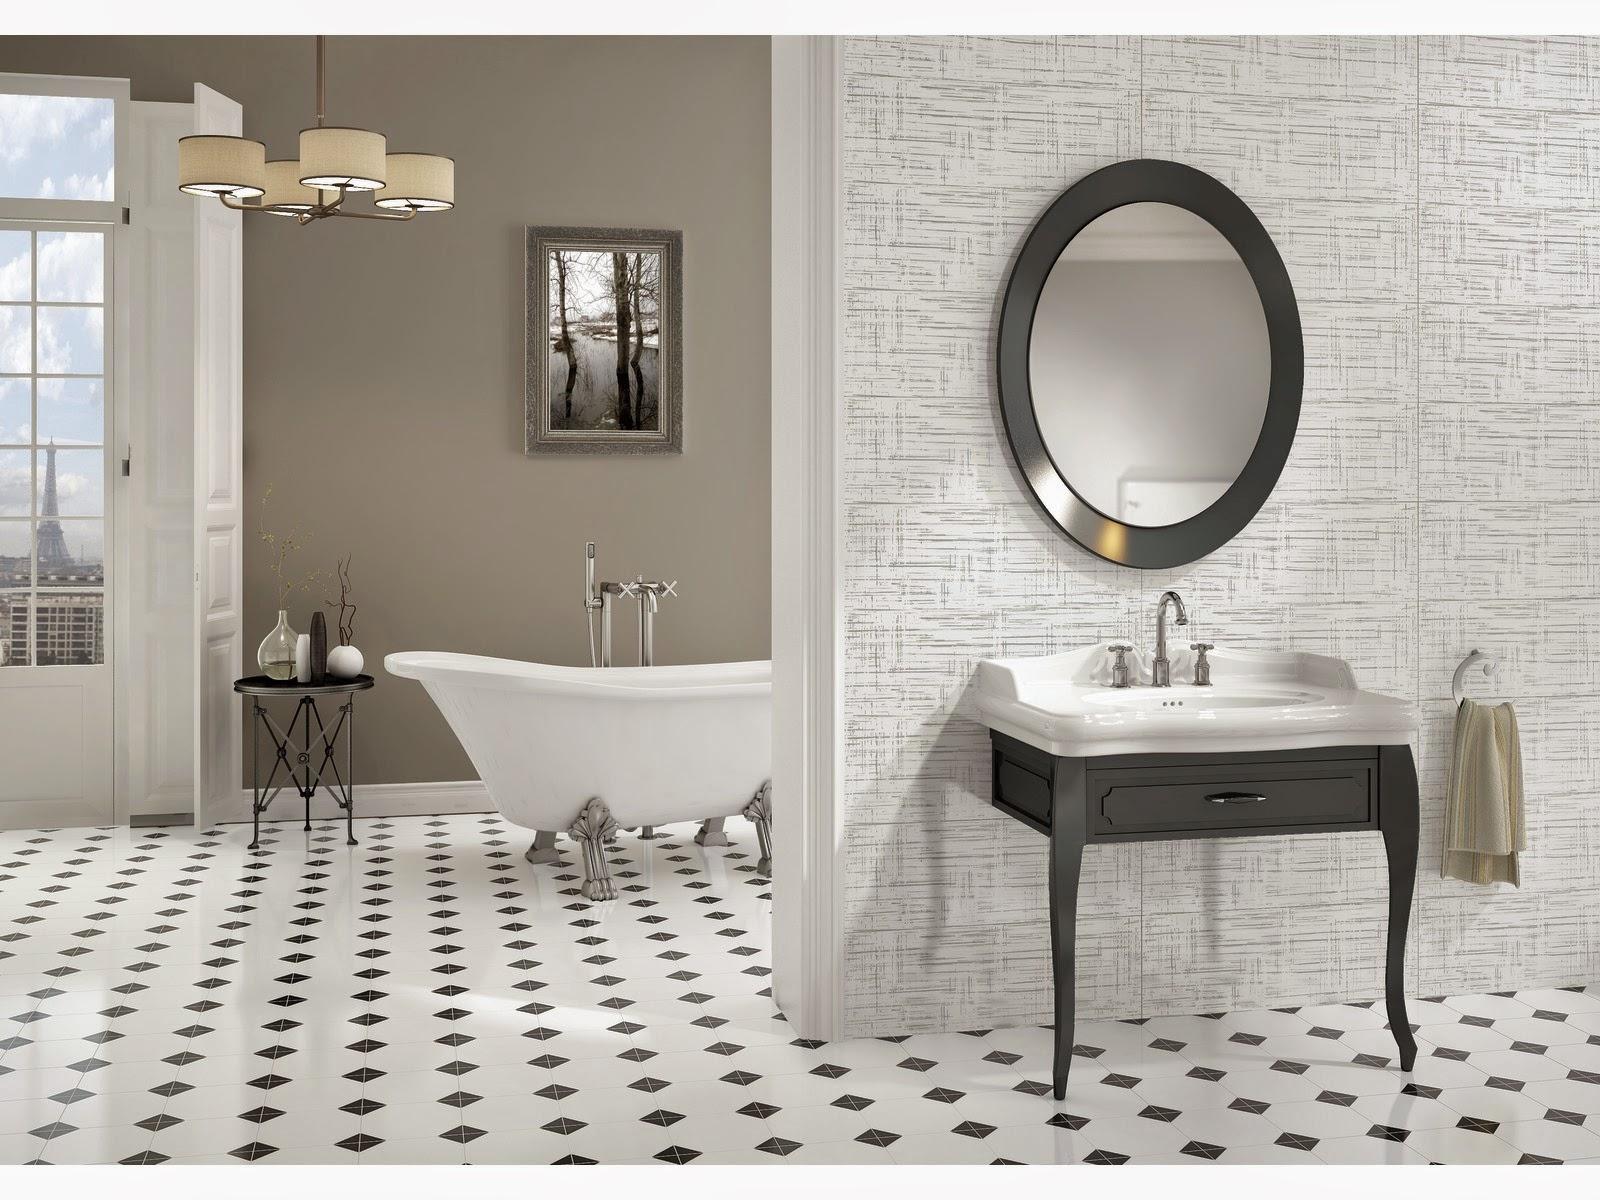 banyo modeller banyo dekorasyonu 2013 2014 banyo. Black Bedroom Furniture Sets. Home Design Ideas